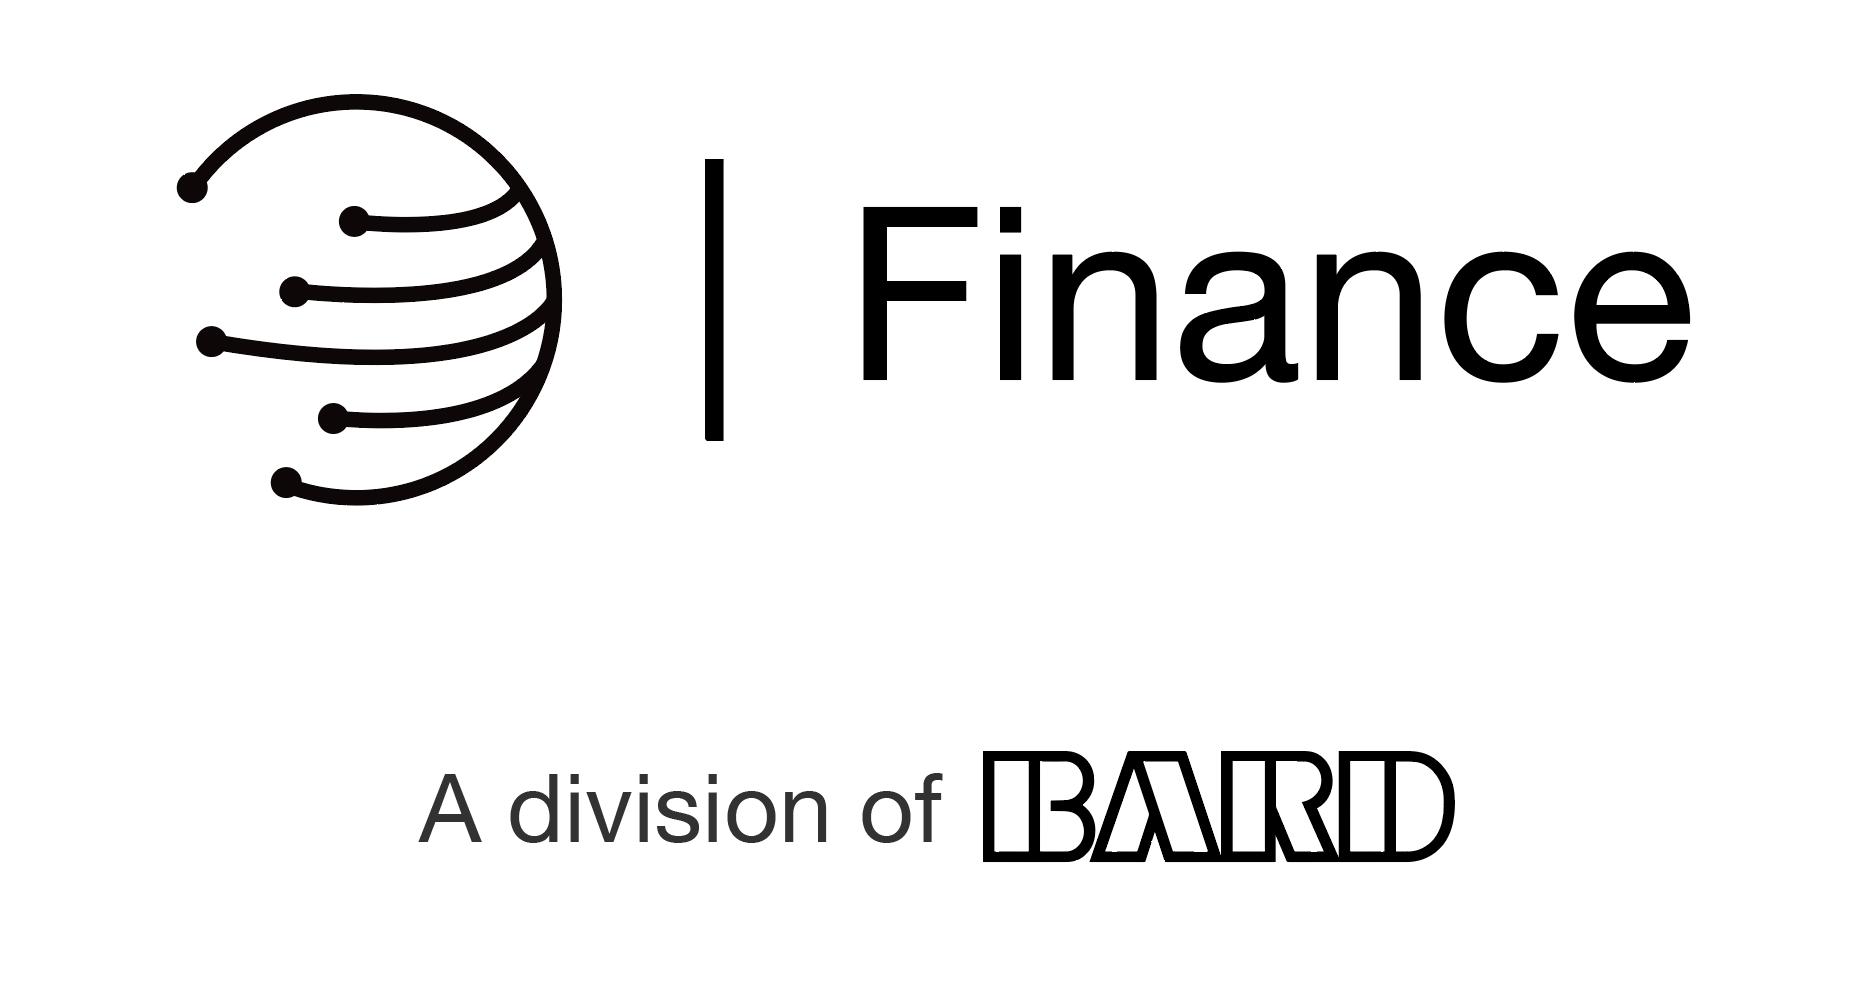 BardFinance_GlobeLogo4.png